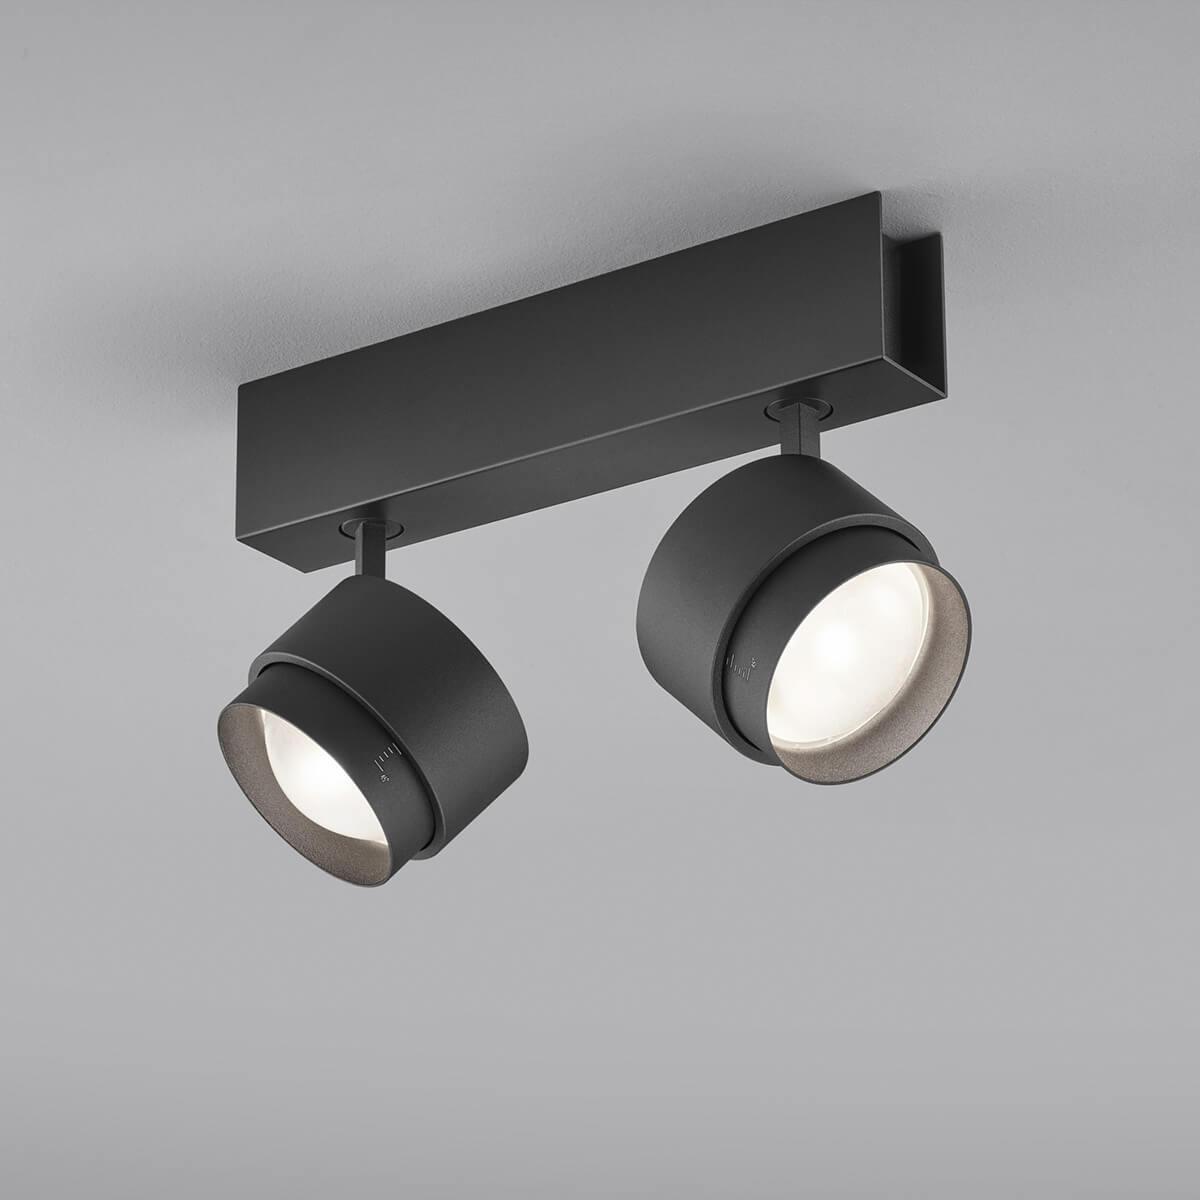 Helestra Pont LED Deckenaufbauleuchte 25/2080.22